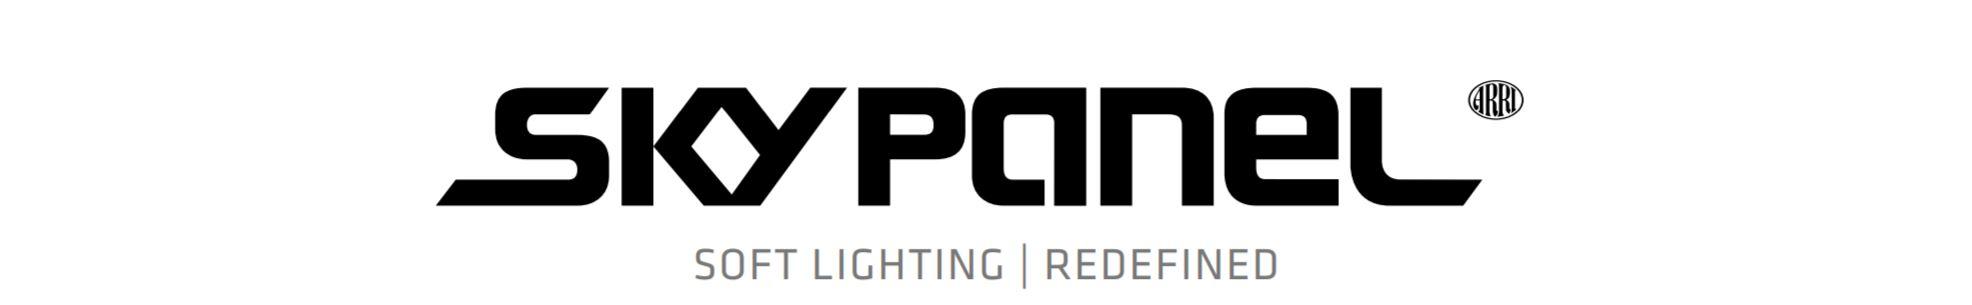 ARRI SkyPanel   JR Lighting and Grip Las Vegas